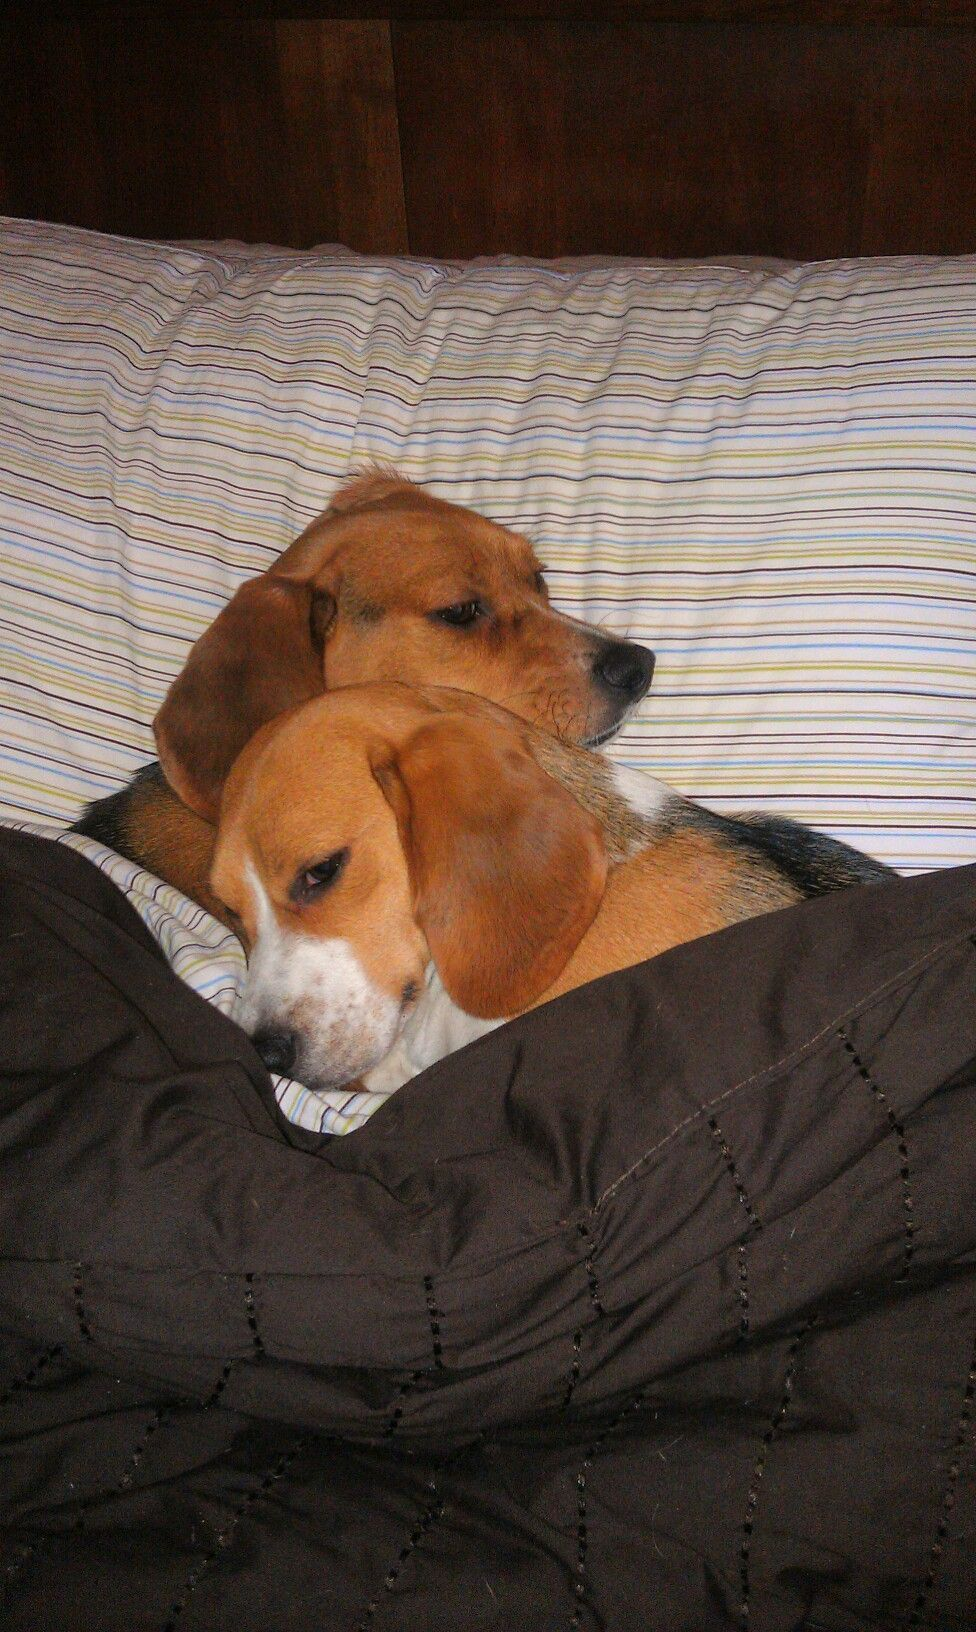 Loving Beagles Beagles Beagle Dog Beagle Puppy Beagle